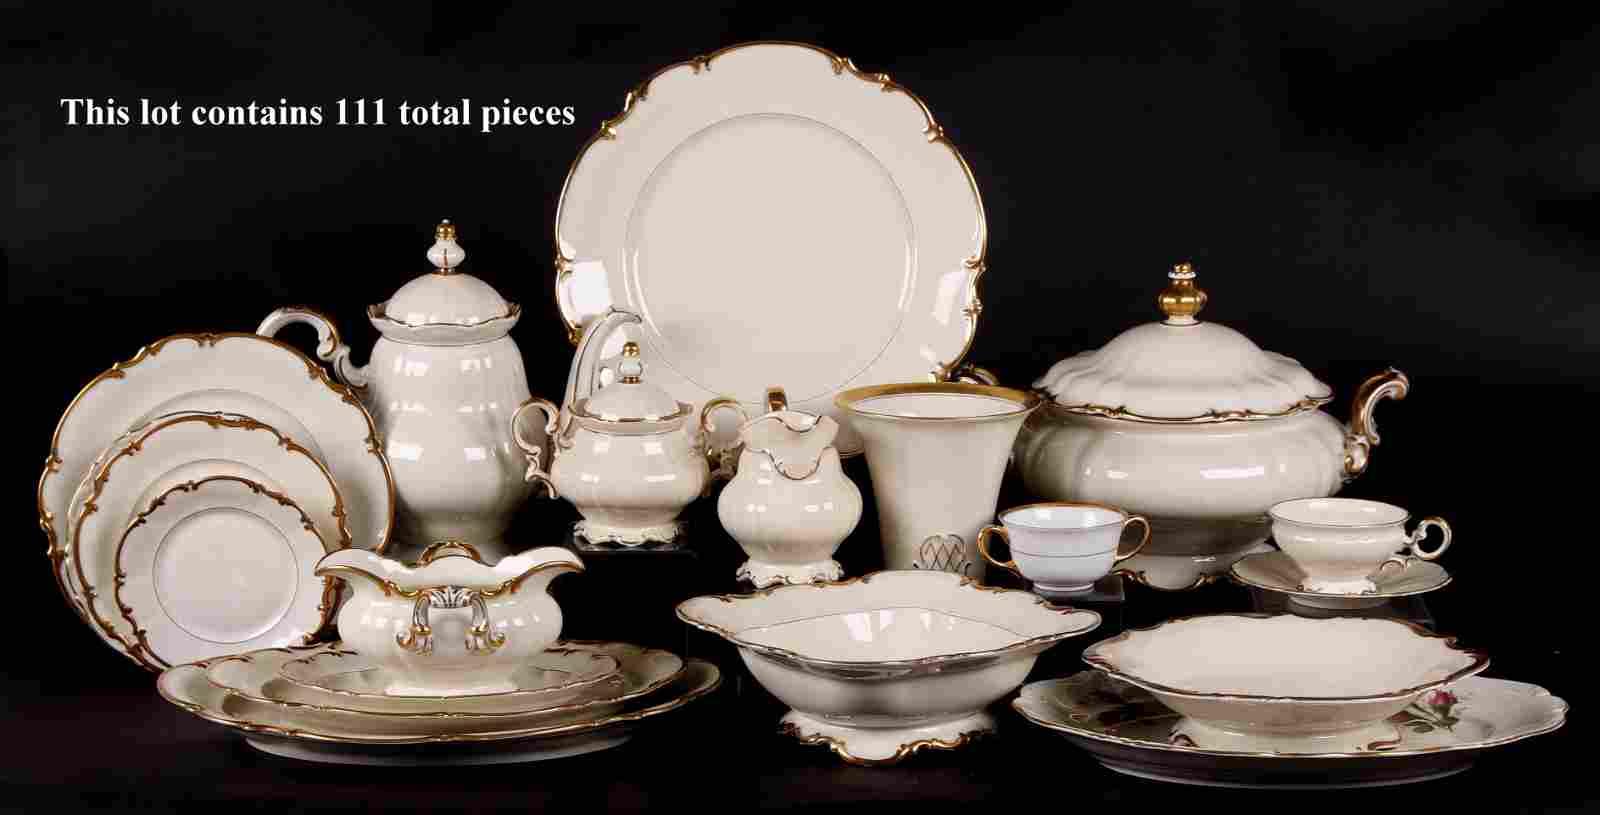 Hutschenreuther Porcelain Service, Other Dinnerware